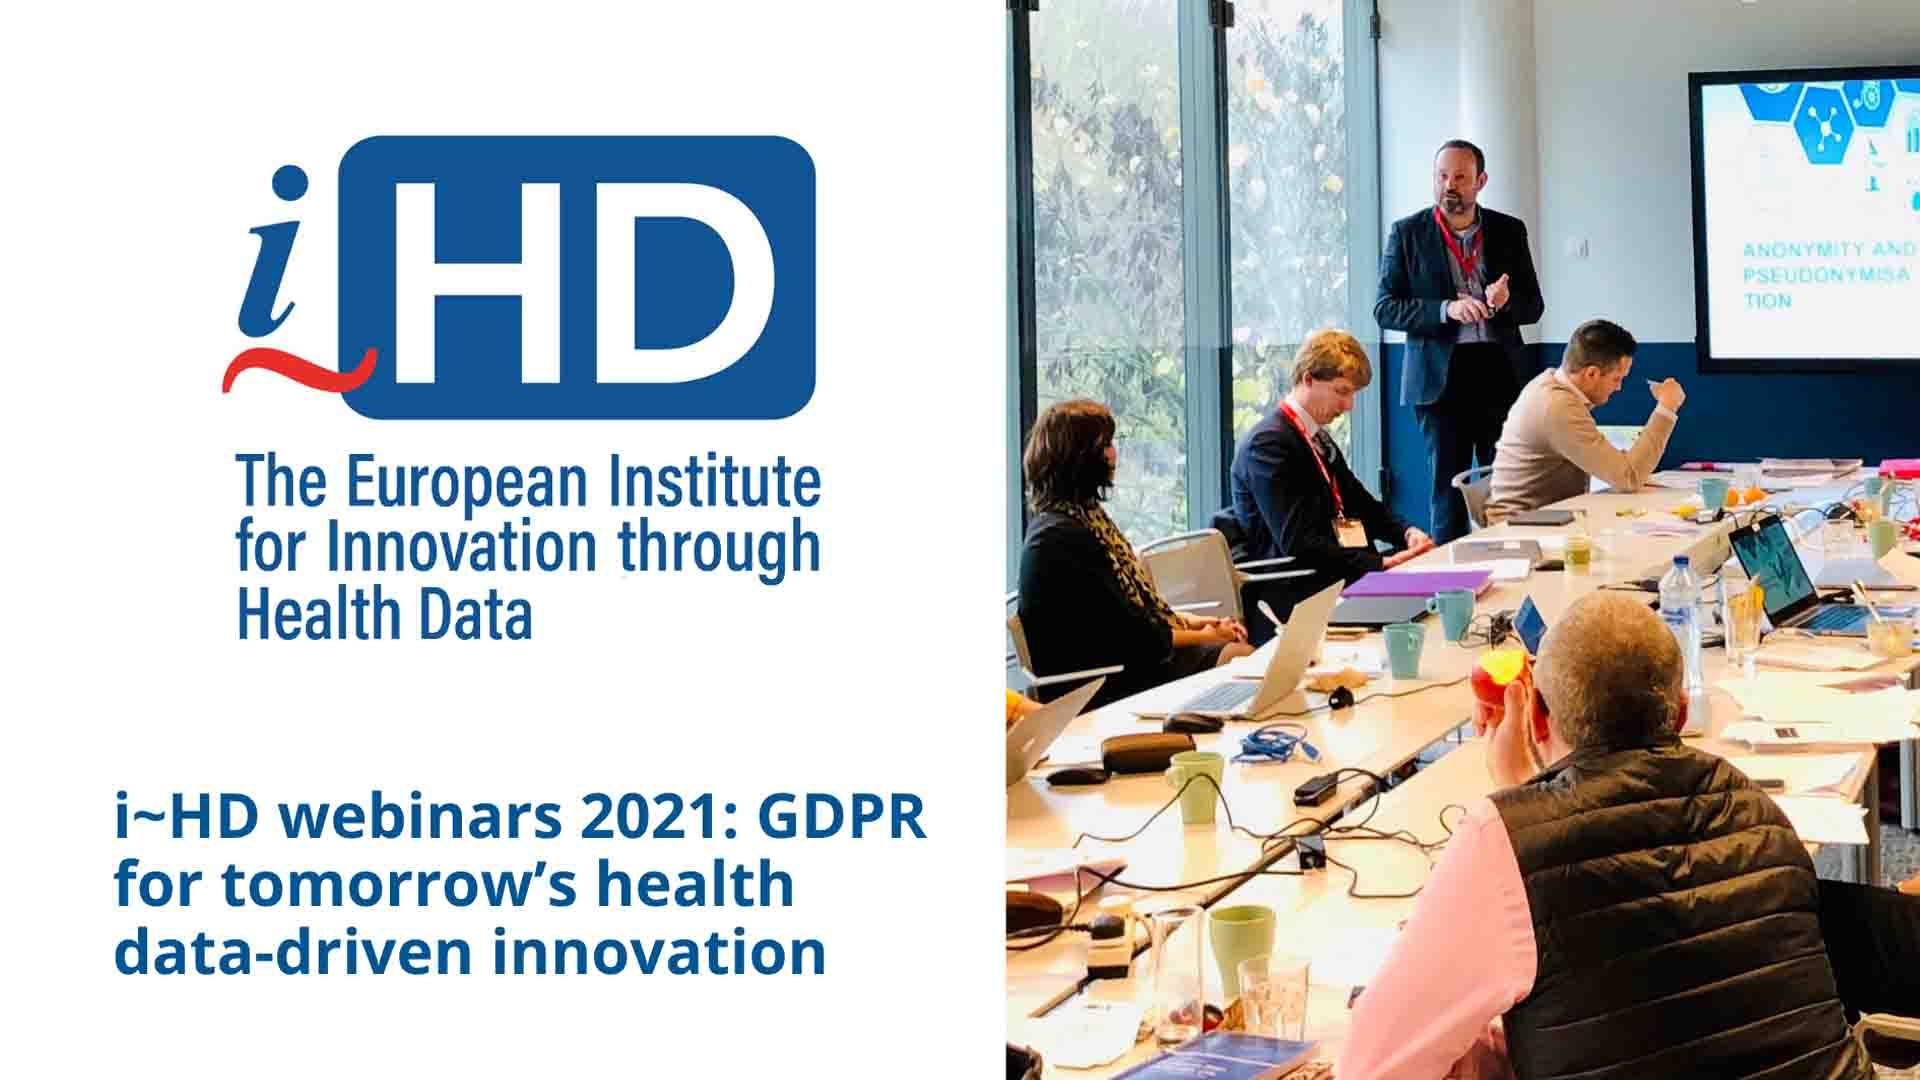 i~HD presents 7 webinars: GDPR for tomorrow's health data-driven innovation (Autumn 2021)